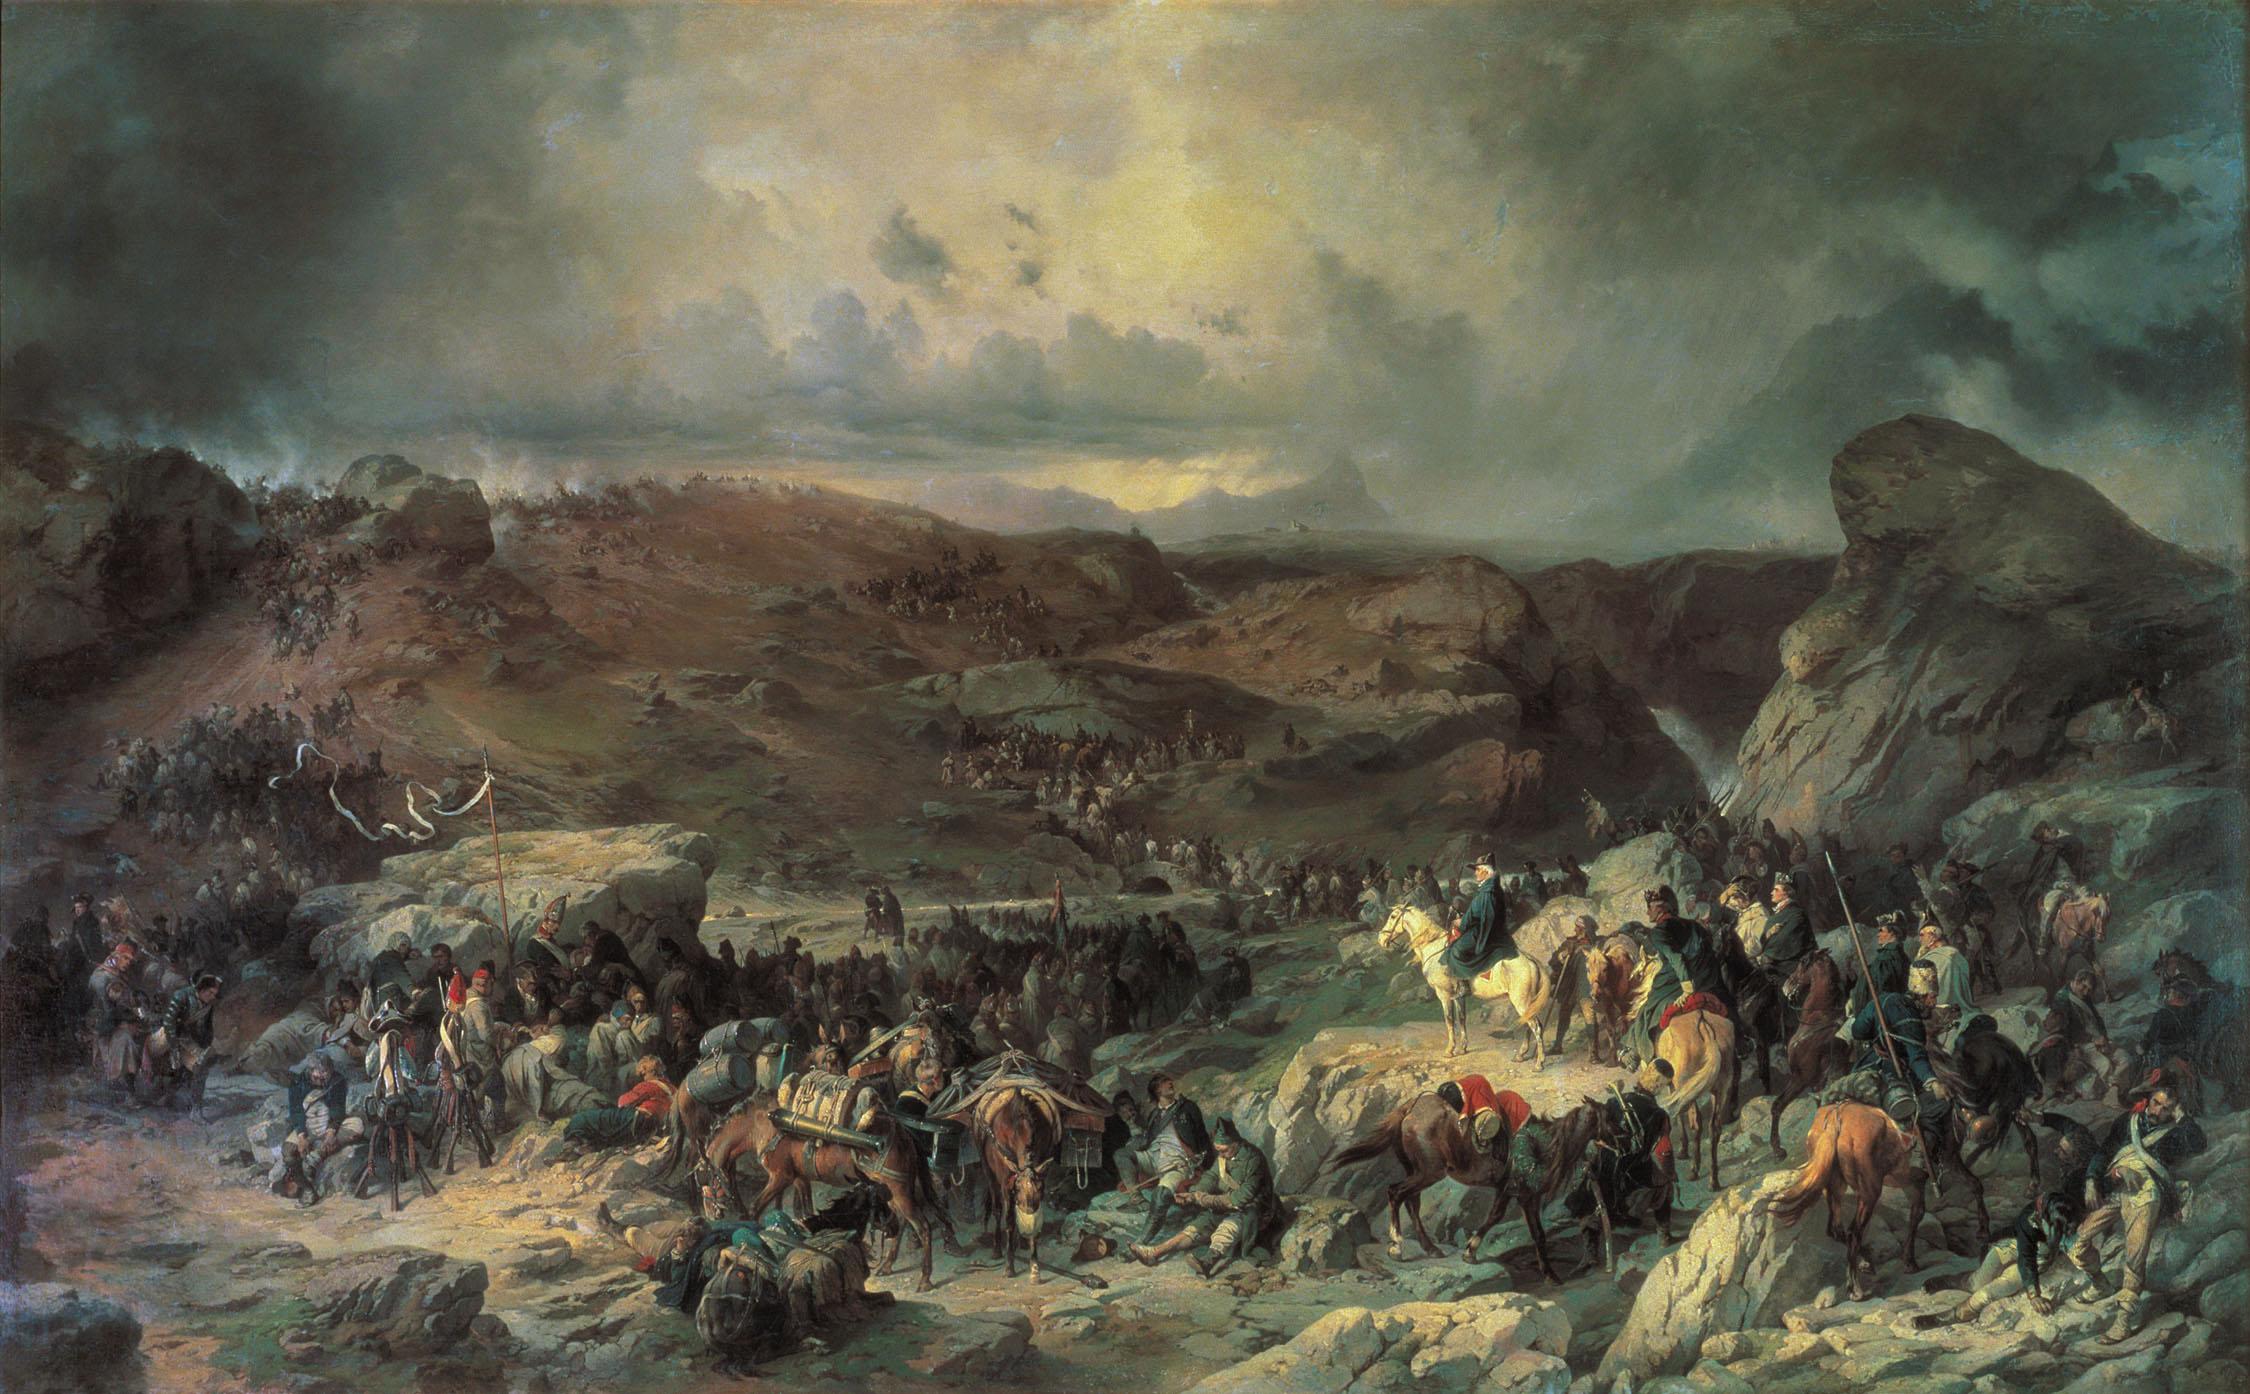 Войны против времени_suvorov-aleksandr-perehod-cherez-alpy